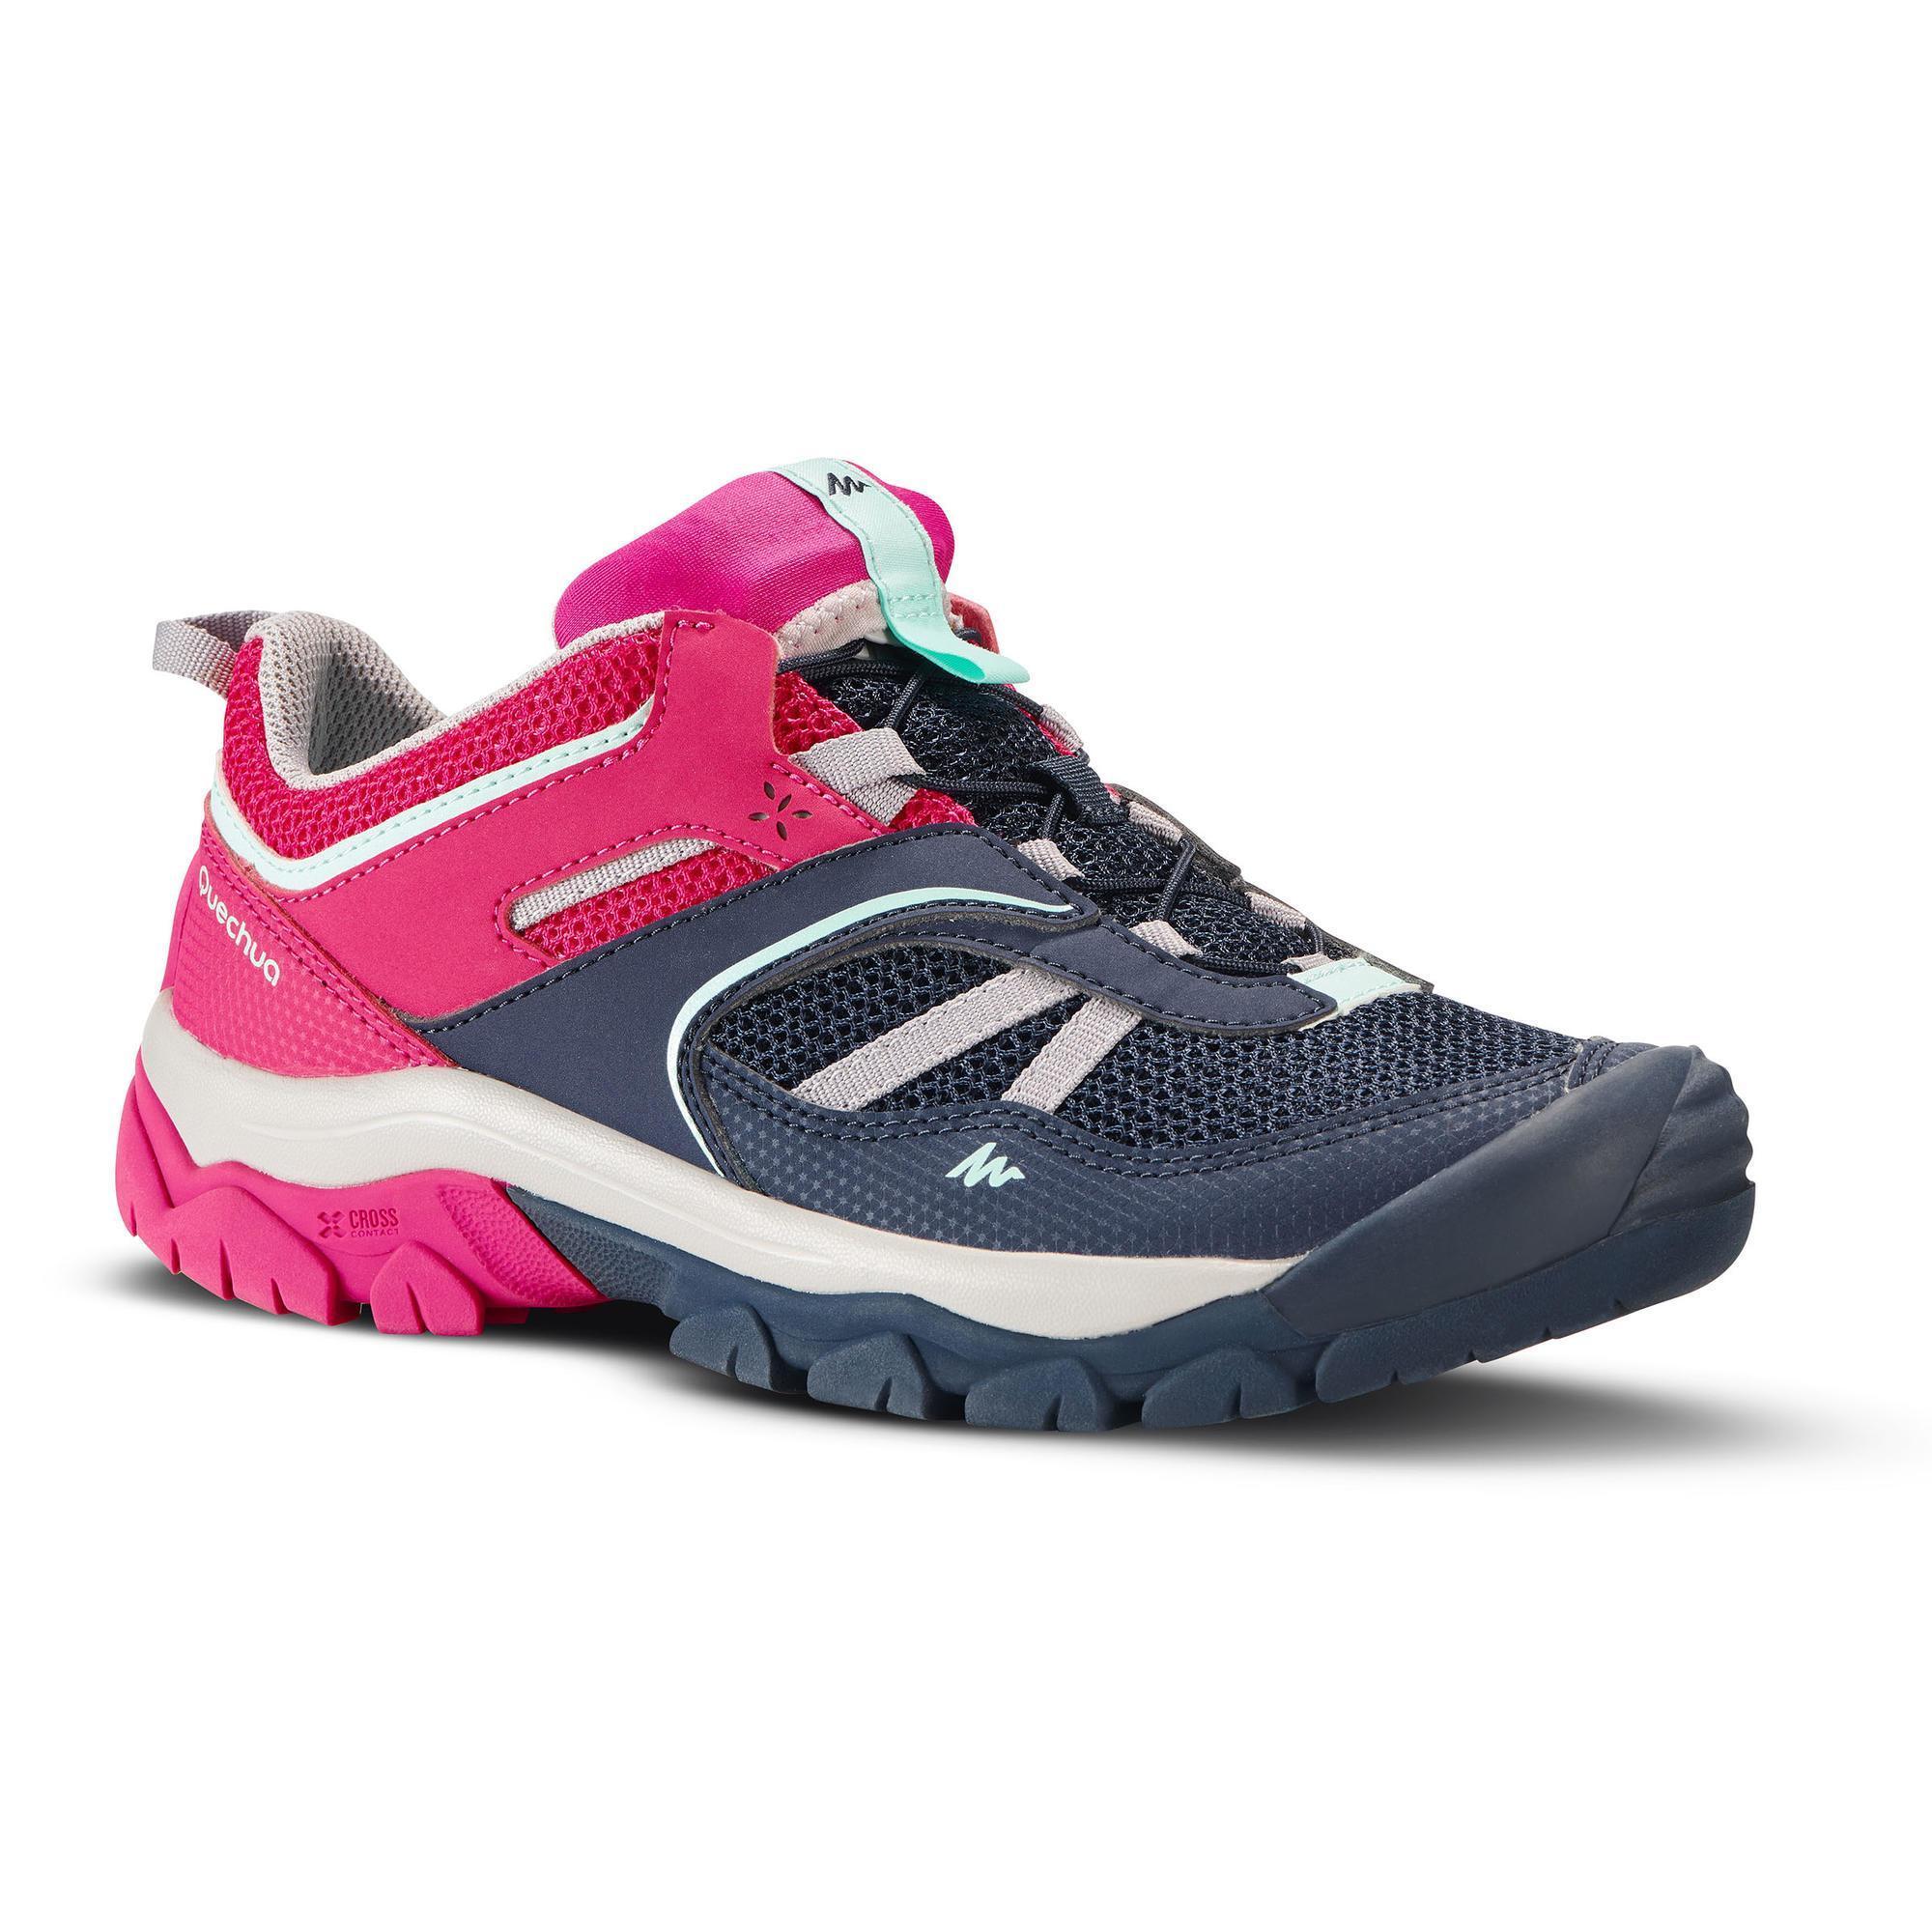 Girl's Shoes | Decathlon Hong Kong